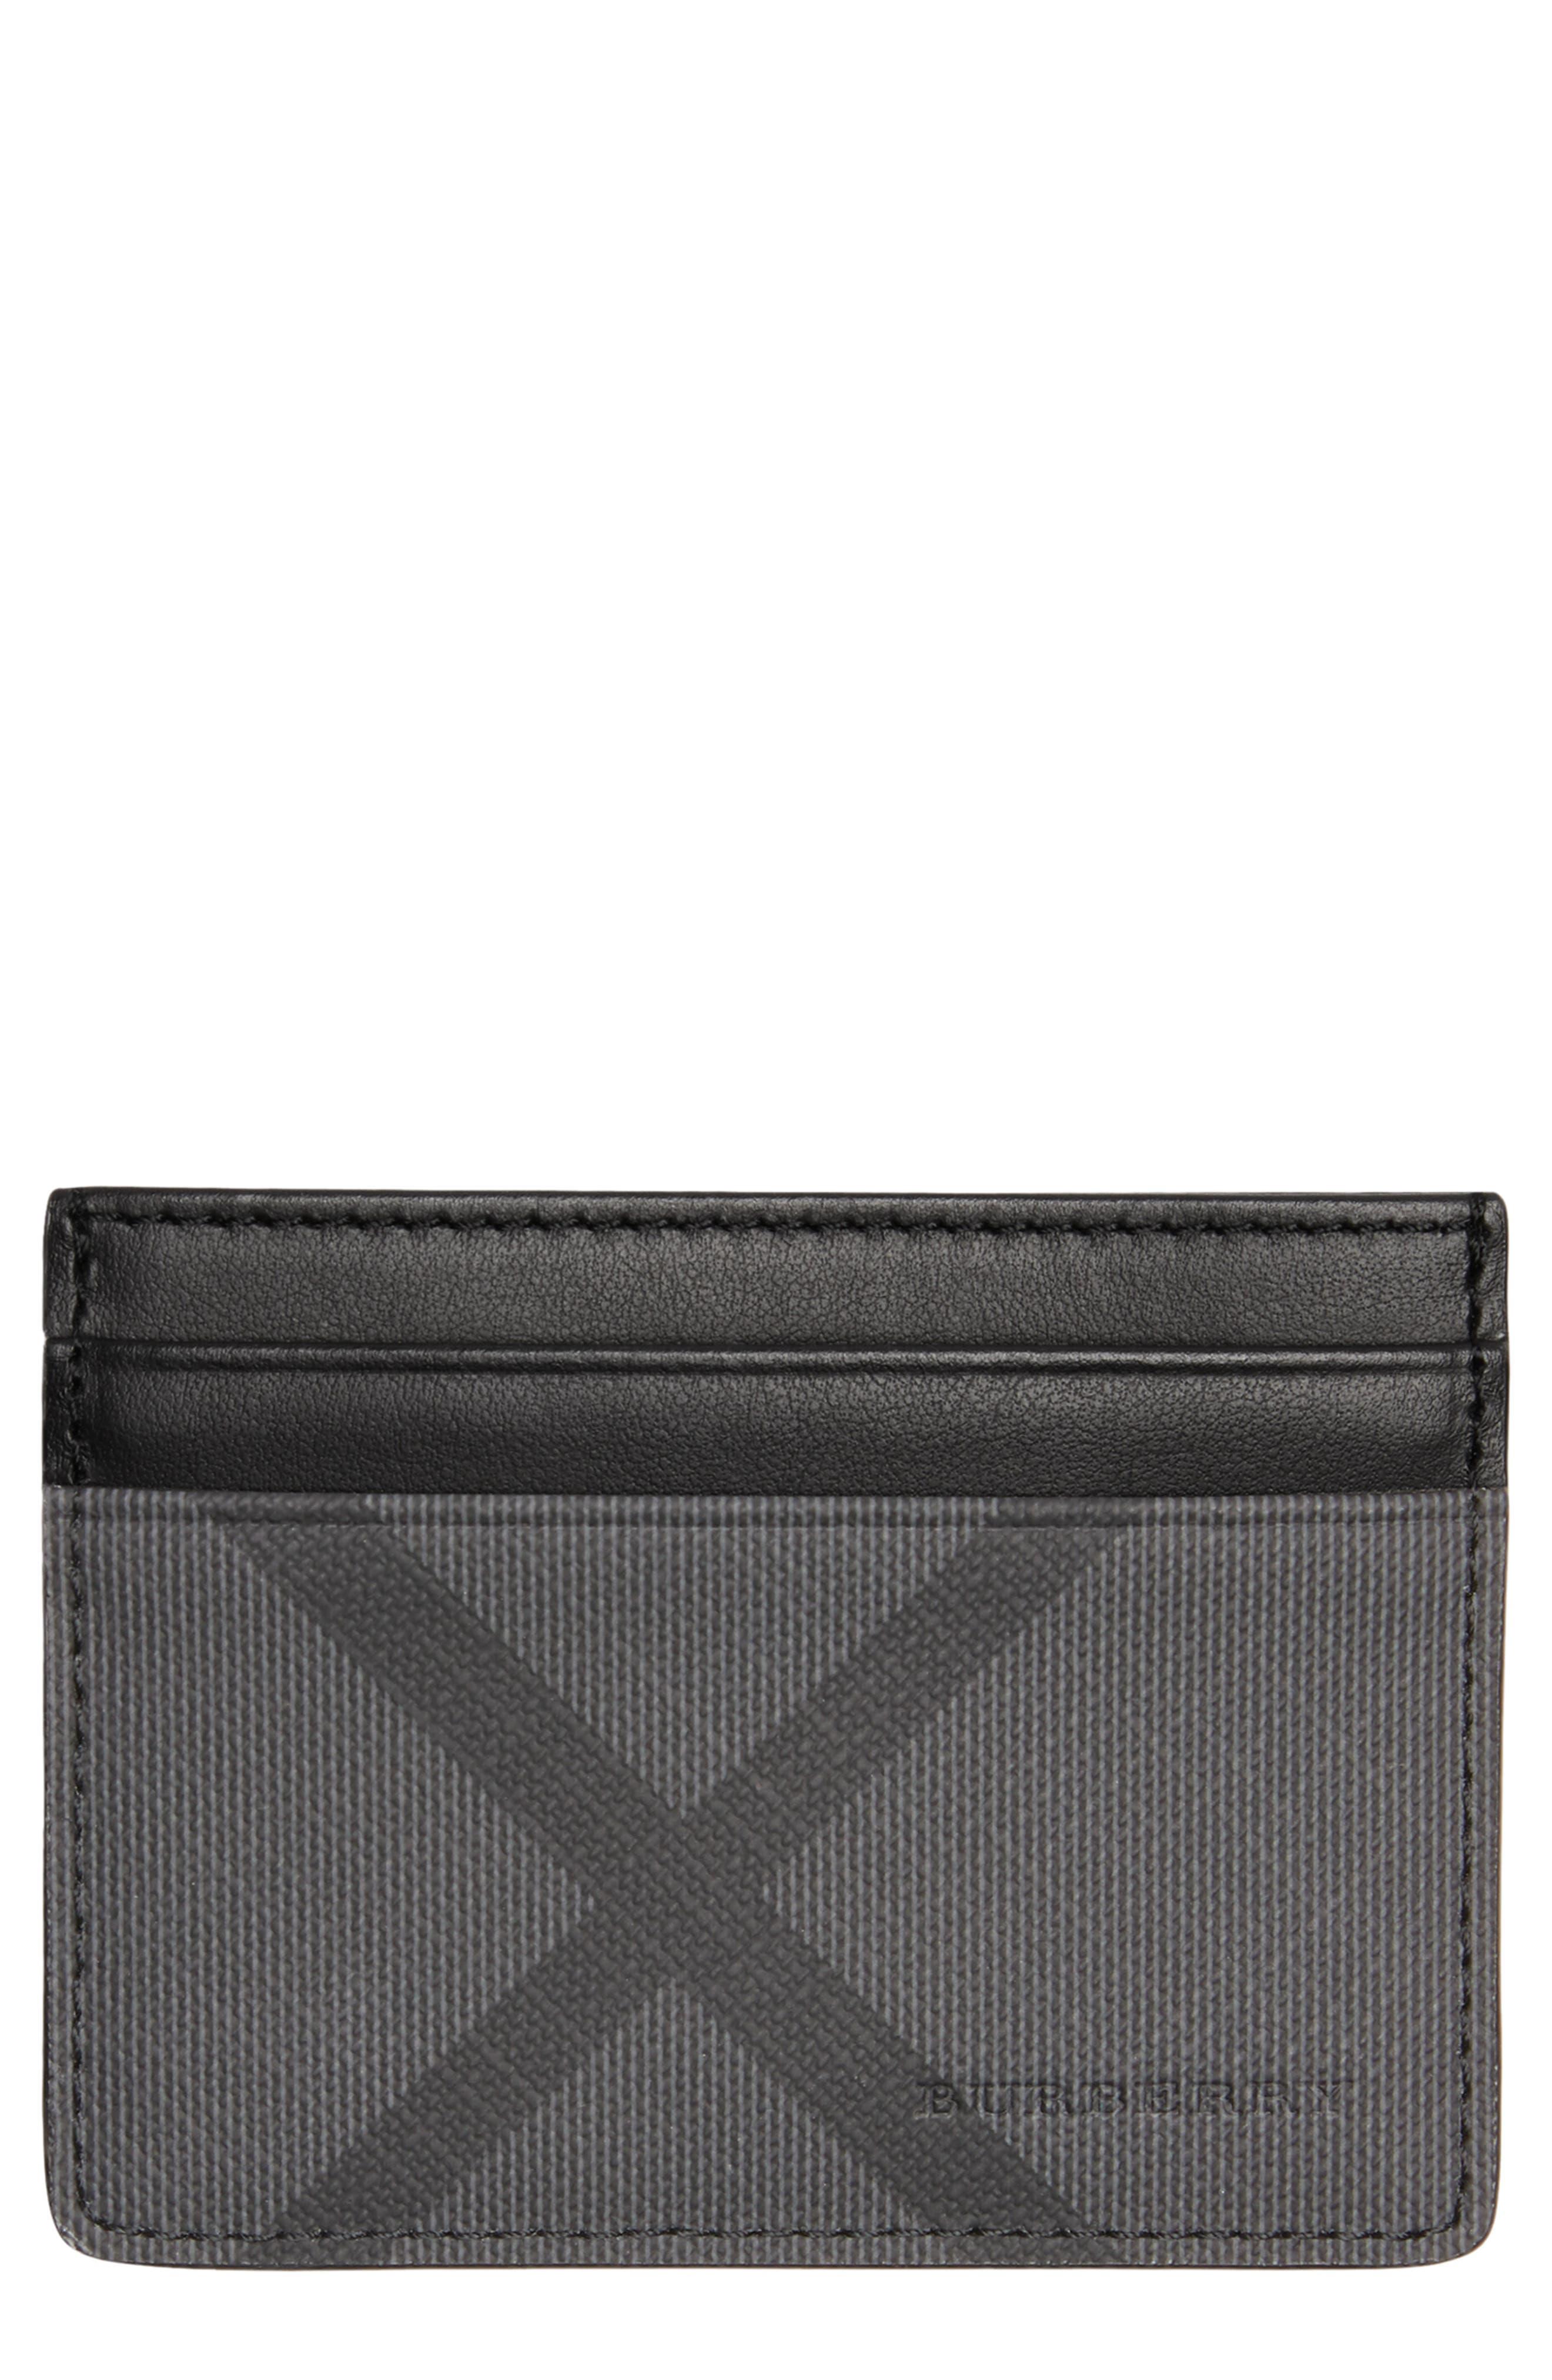 BURBERRY Sandon Card Case, Main, color, CHARCOAL/ BLACK